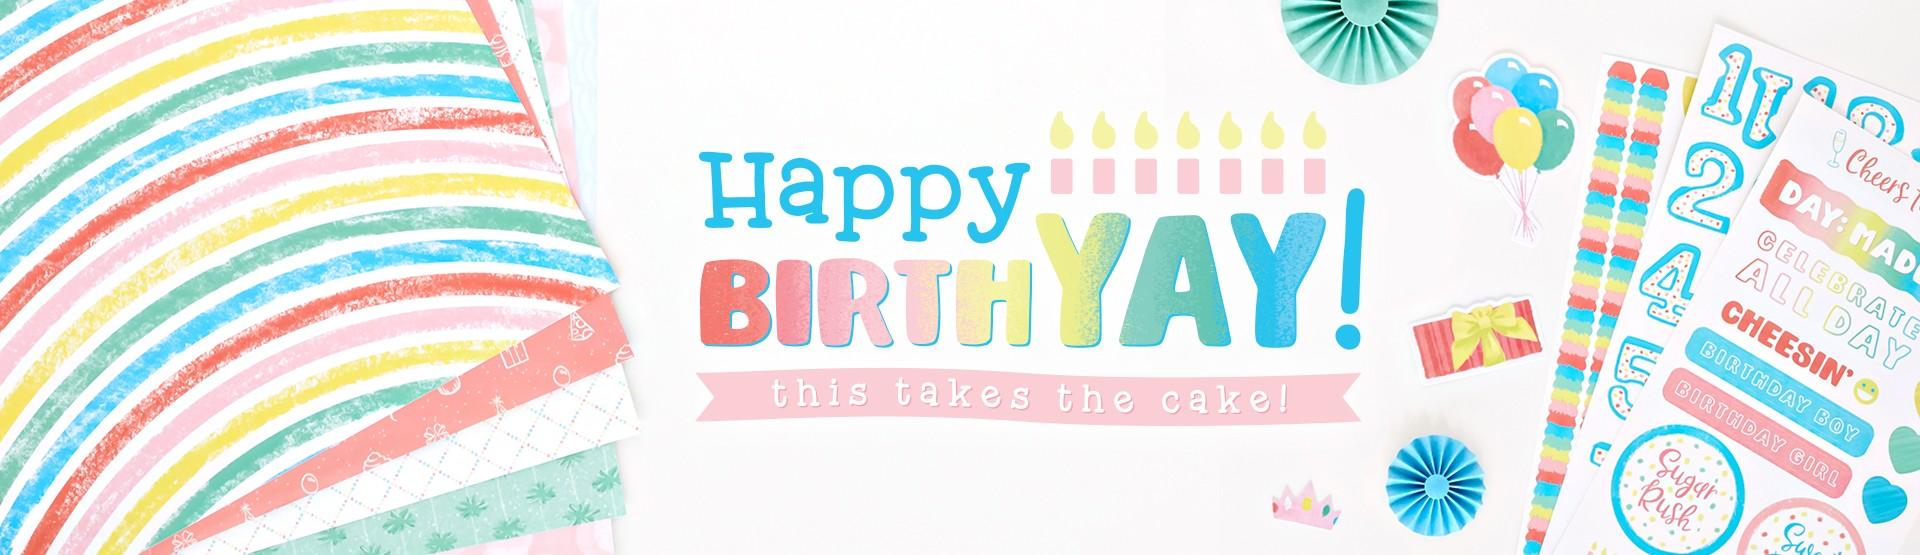 Birthday: Happy BirthYAY